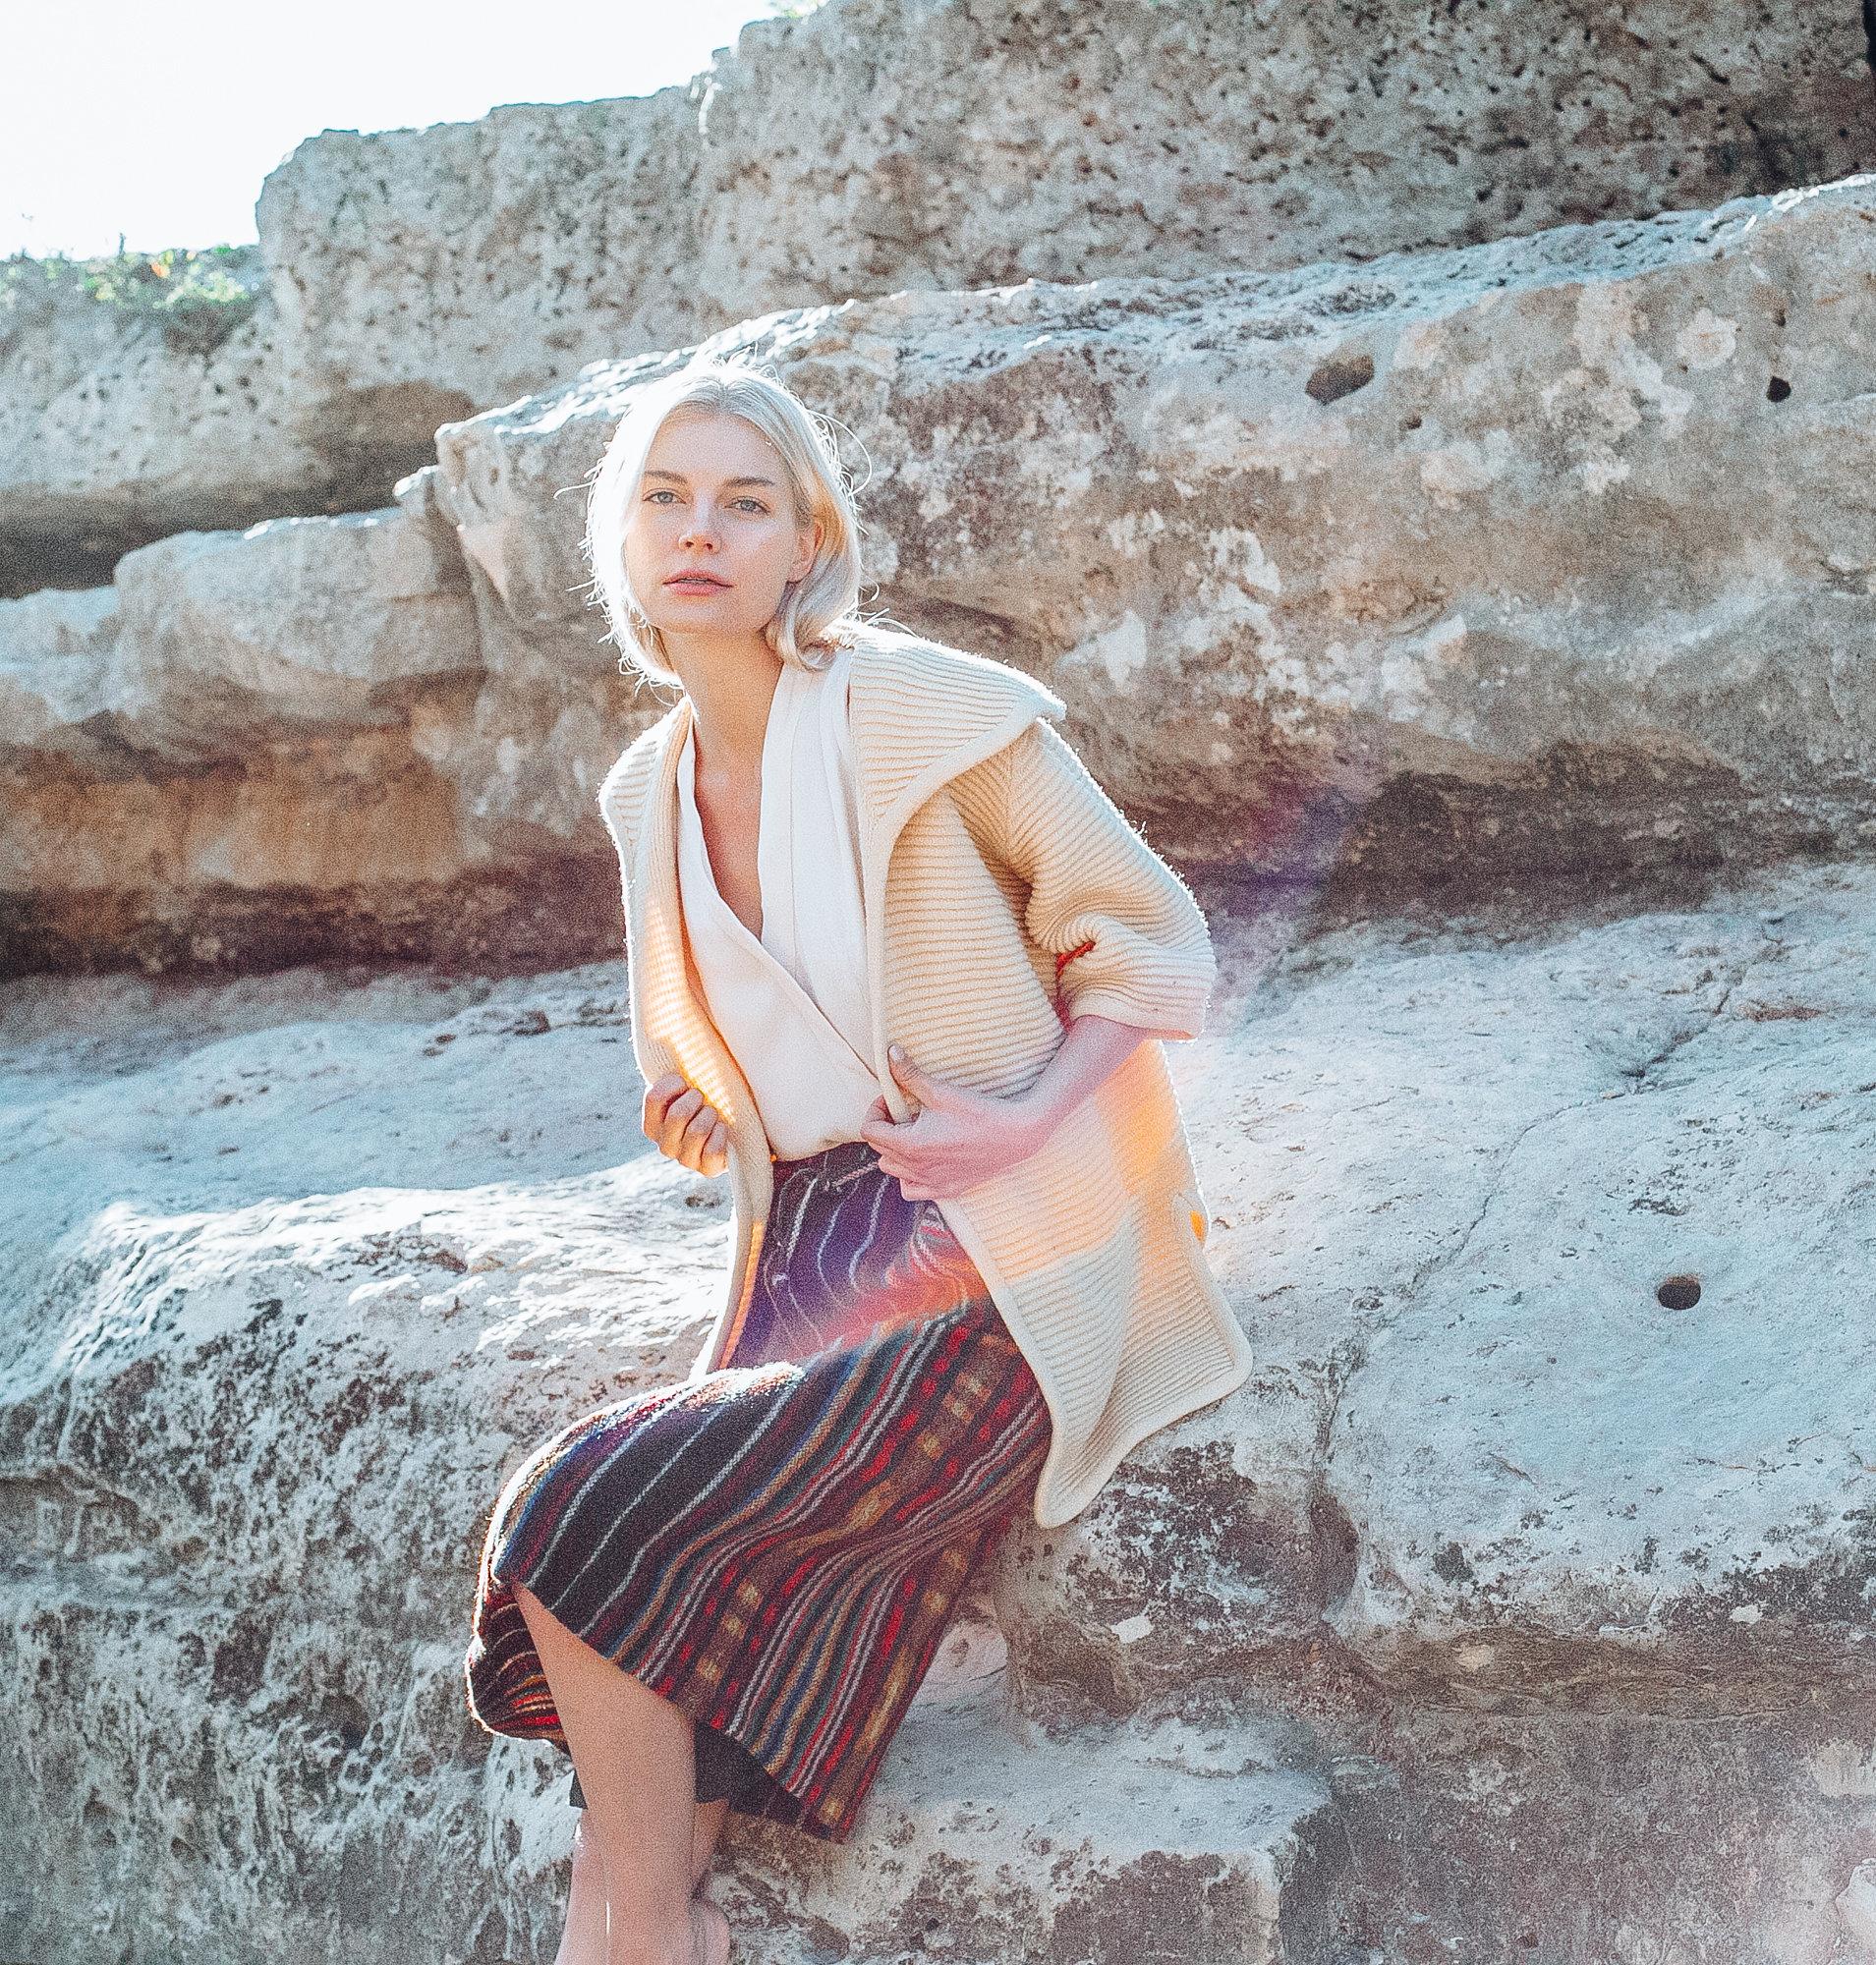 Pieceology-Vintage-1950s-1960s-Cream-Wool-Short-Sleeved-Sweater-Jacket-3.jpg